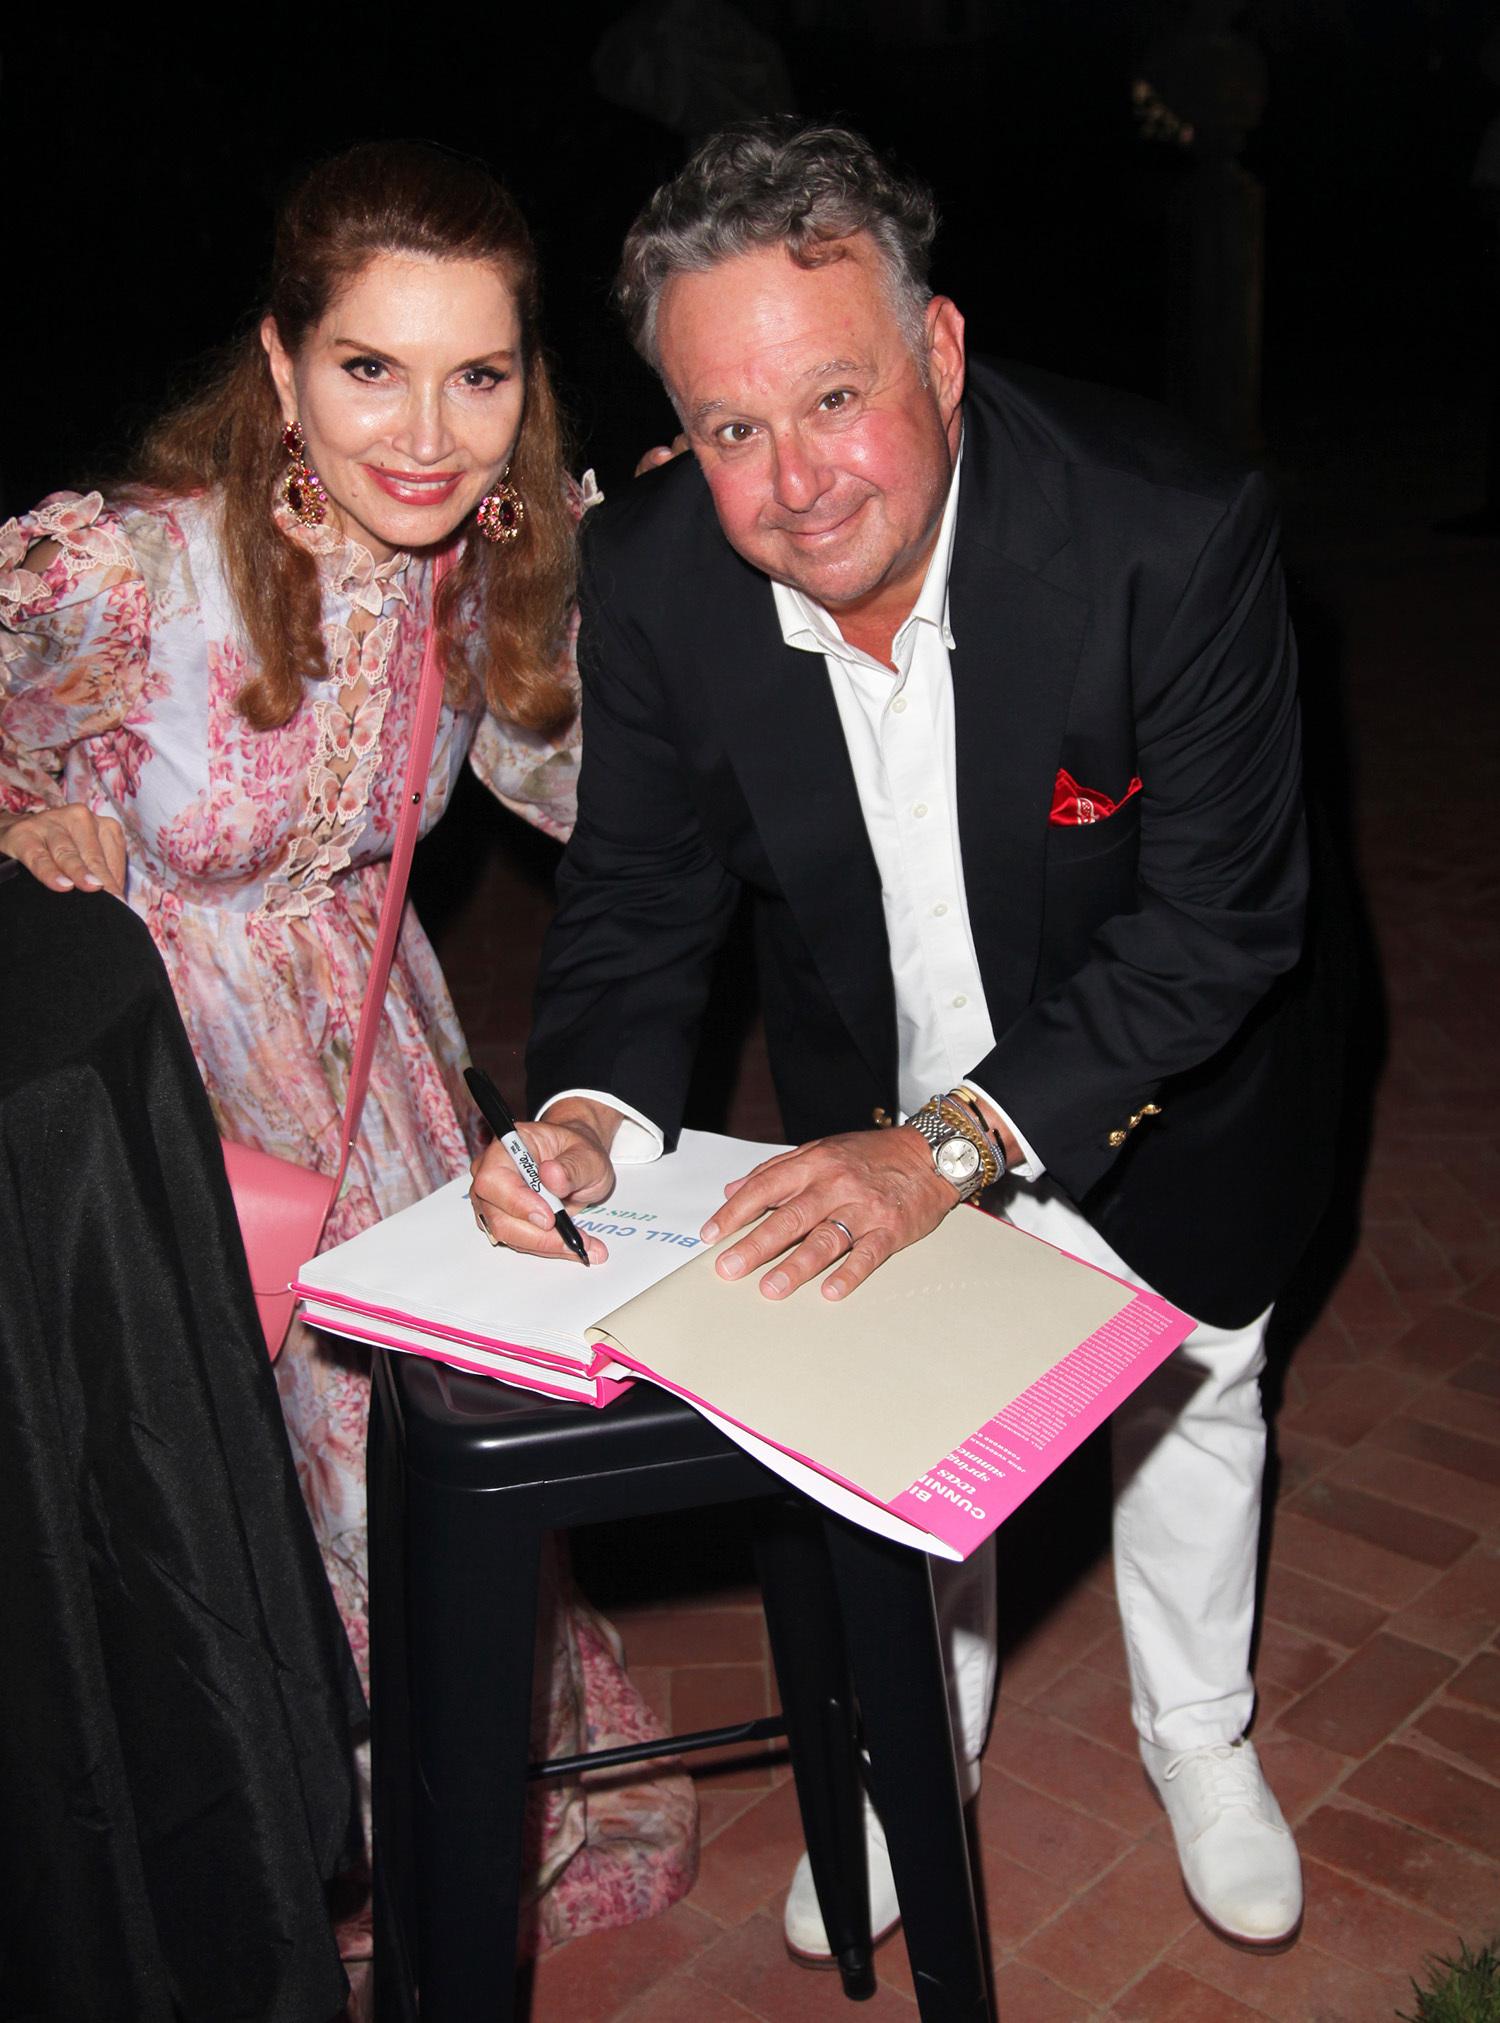 Author Steven Stolman signs a copy of